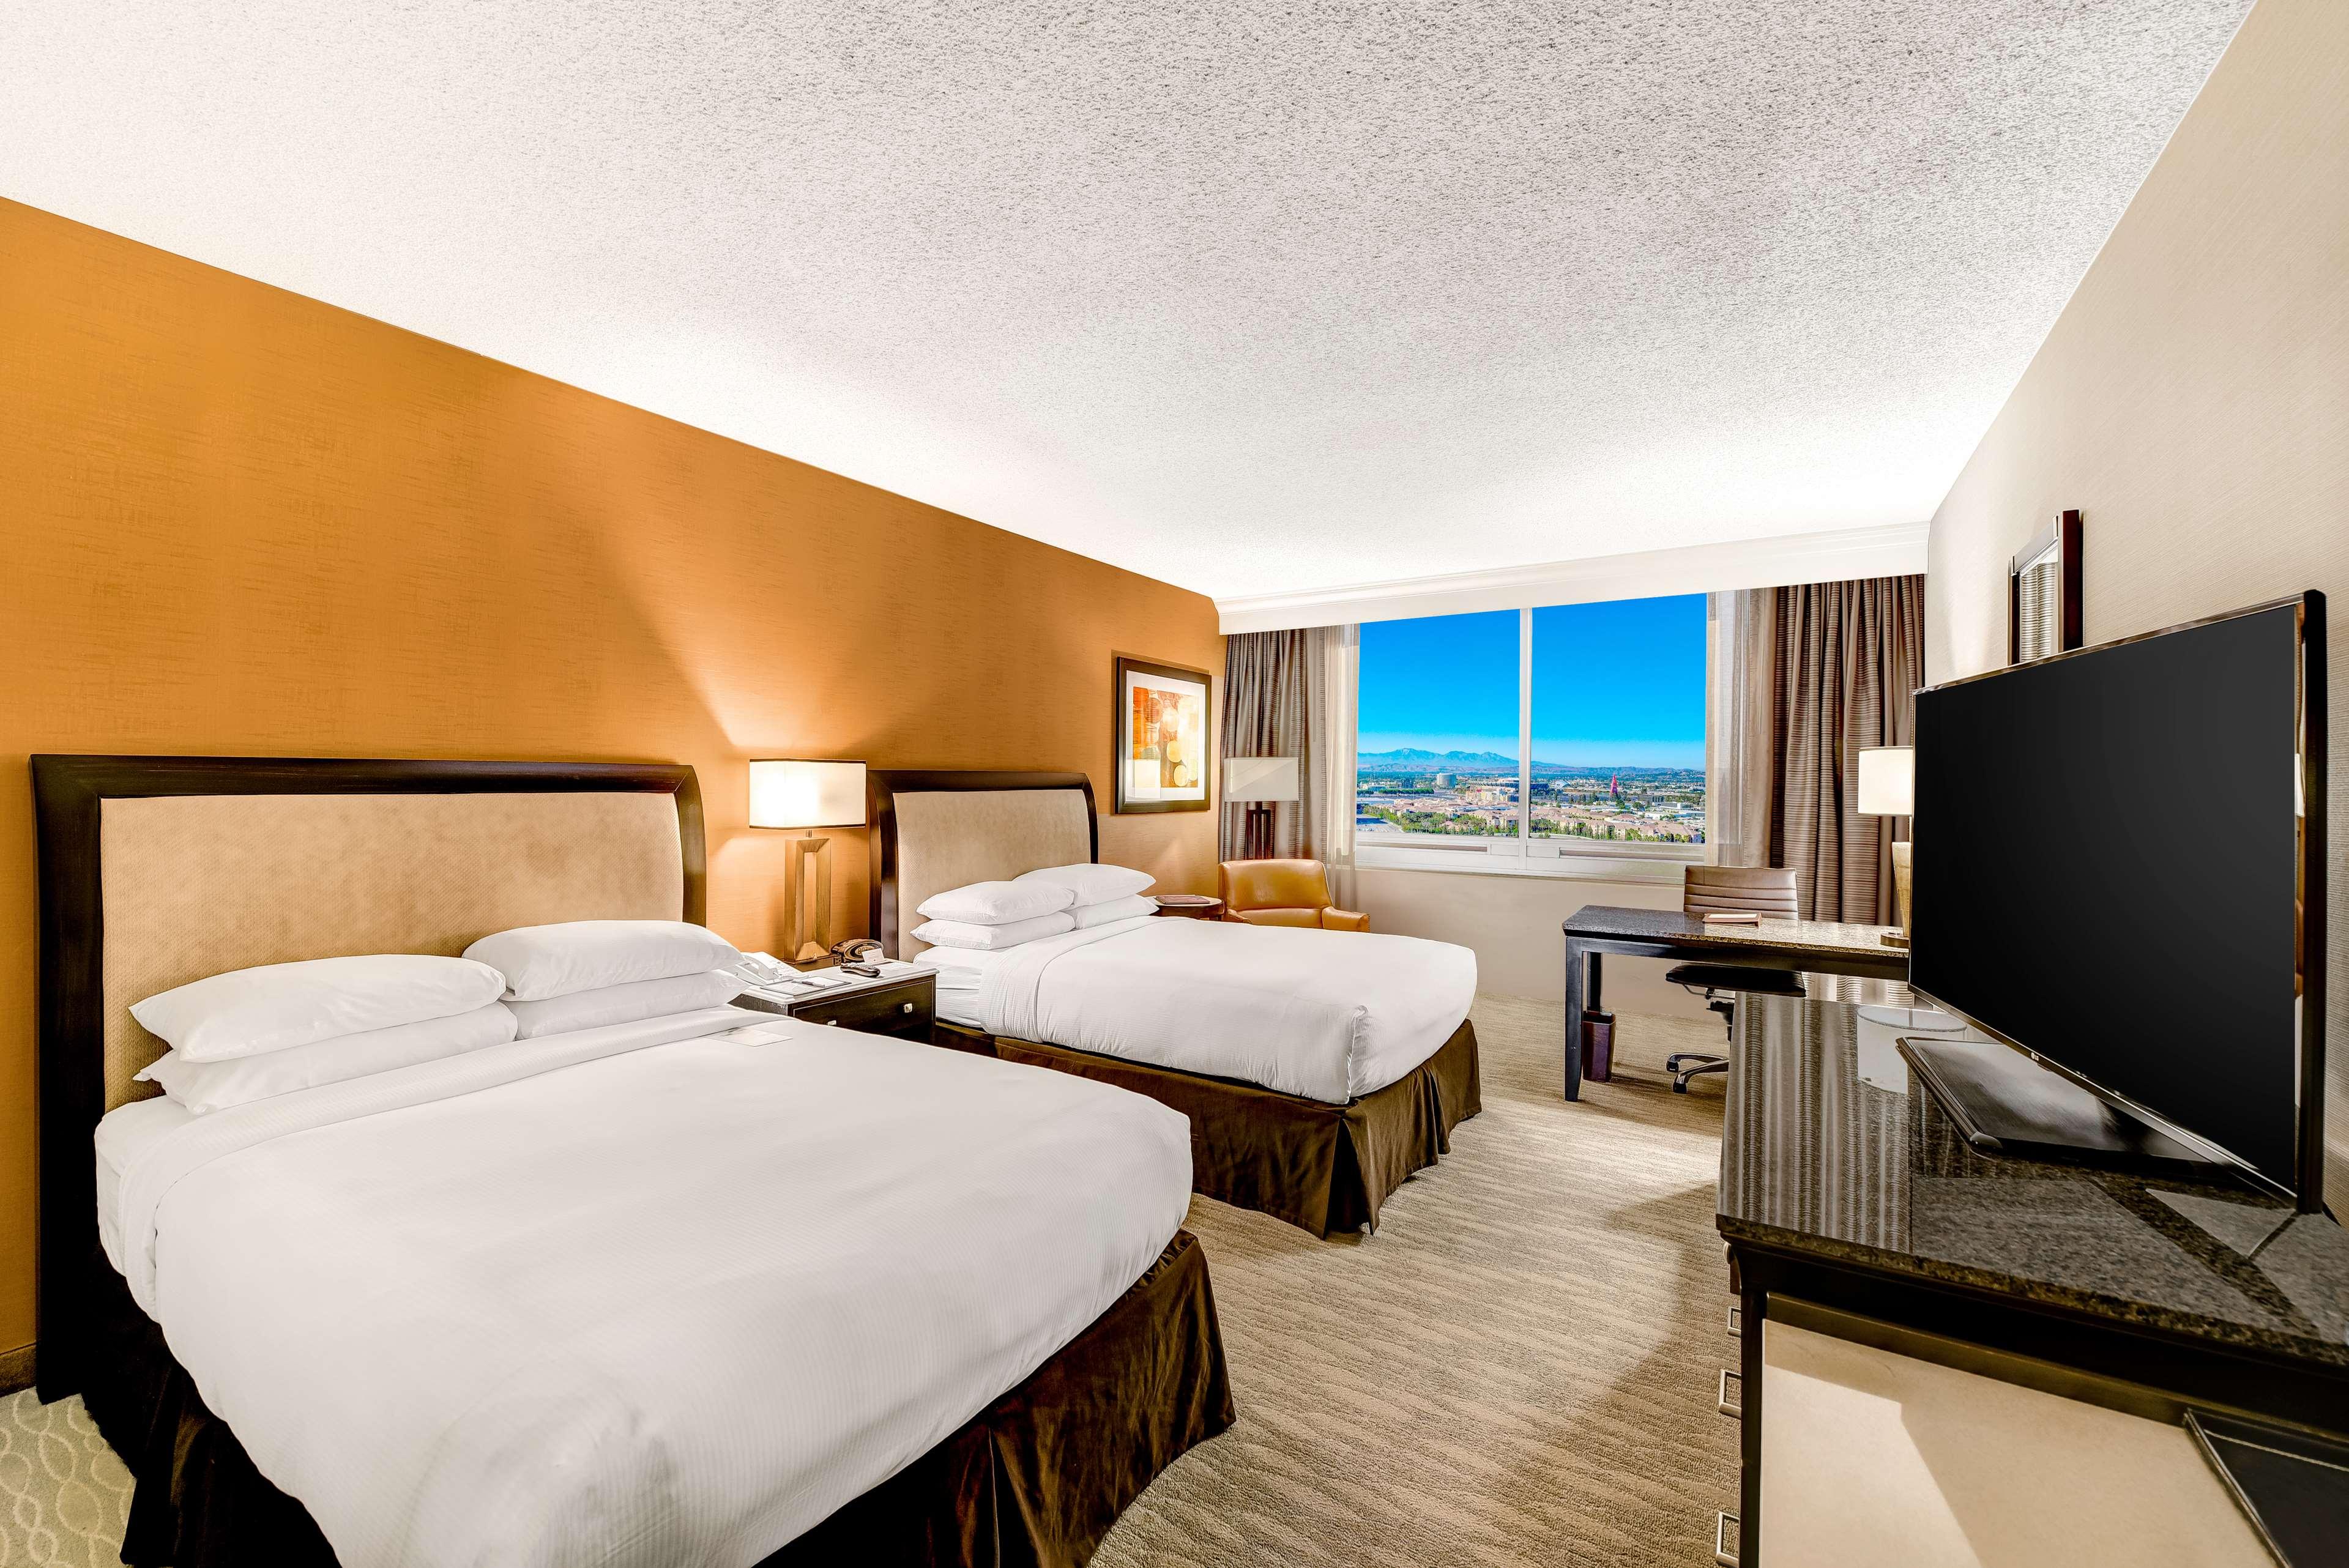 DoubleTree by Hilton Hotel Anaheim - Orange County image 42